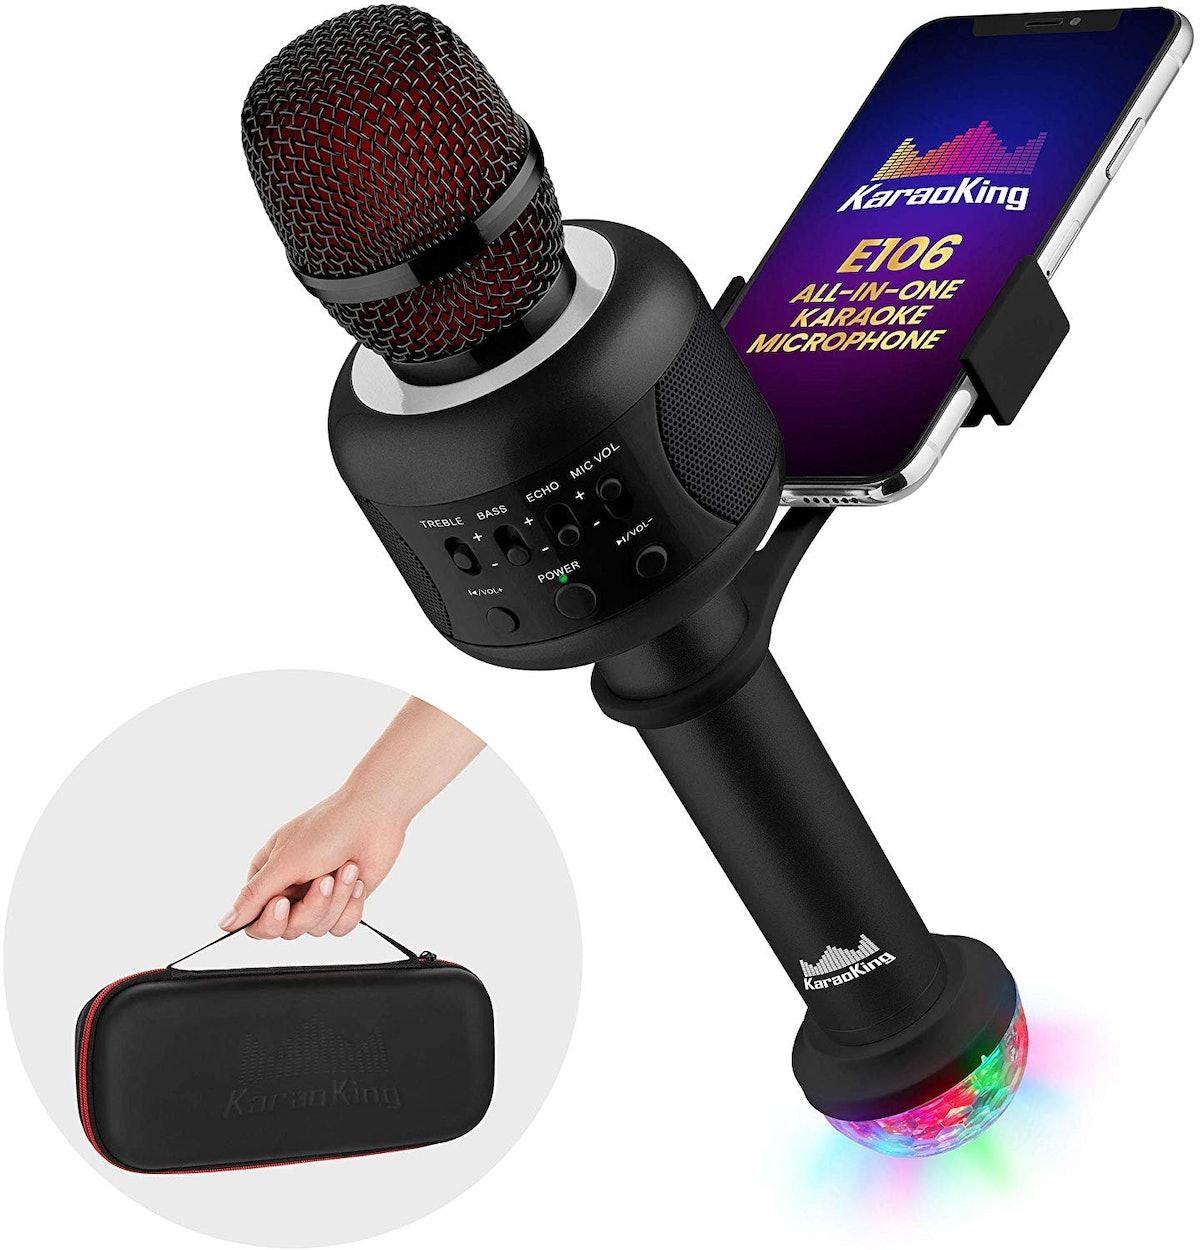 KaraoKing Bluetooth Karaoke Microphone